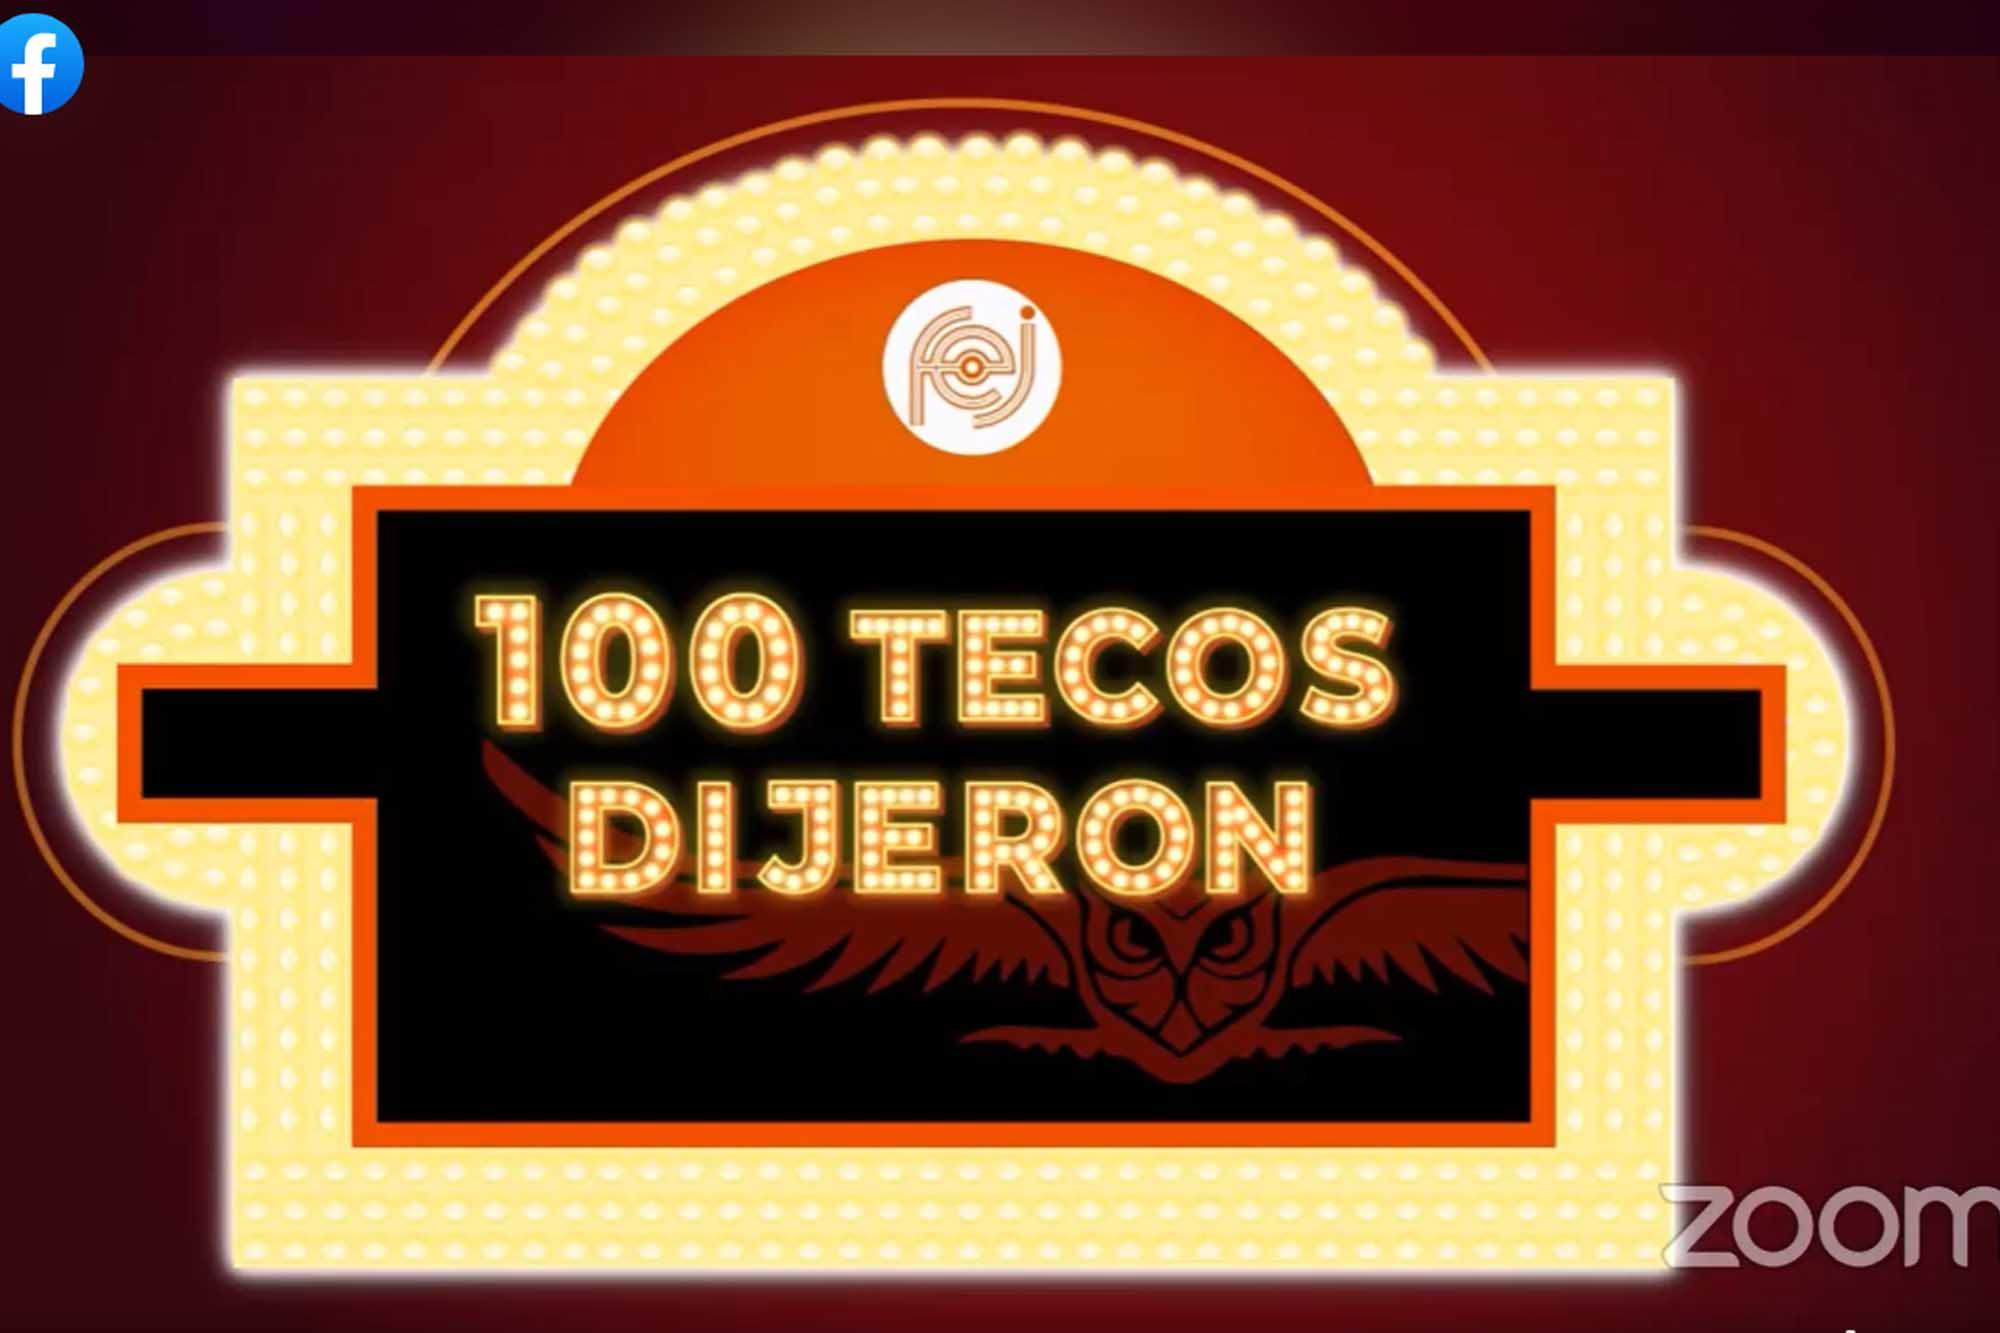 100 Tecos Dijeron 080920